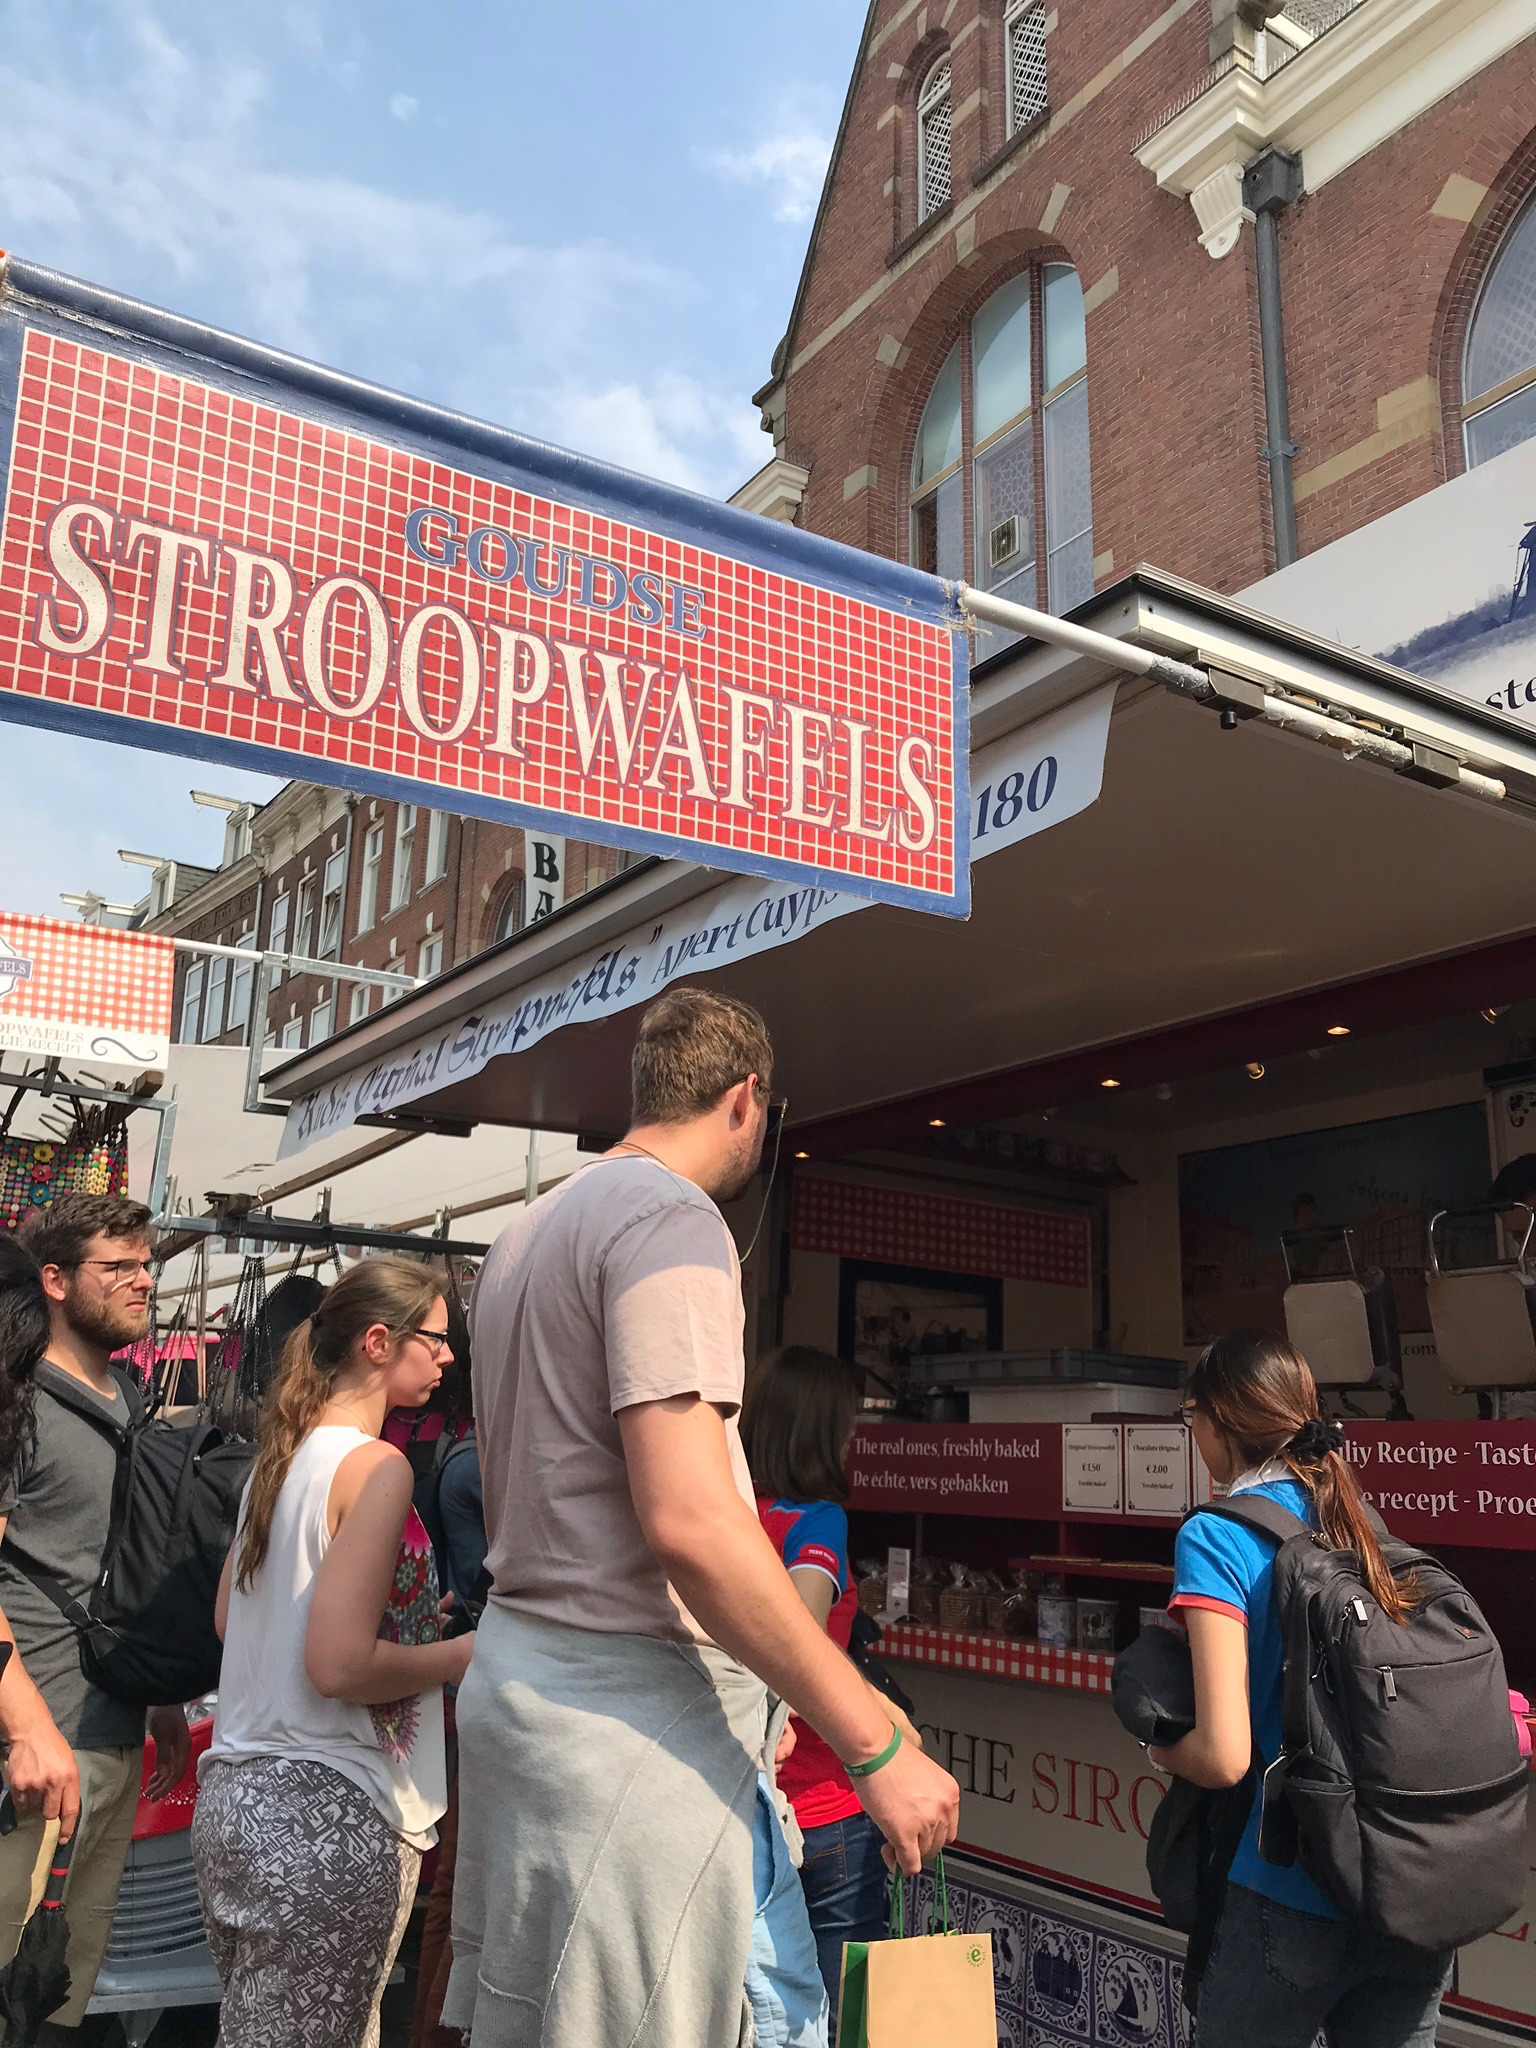 Wanderlust bee - Amsterdam